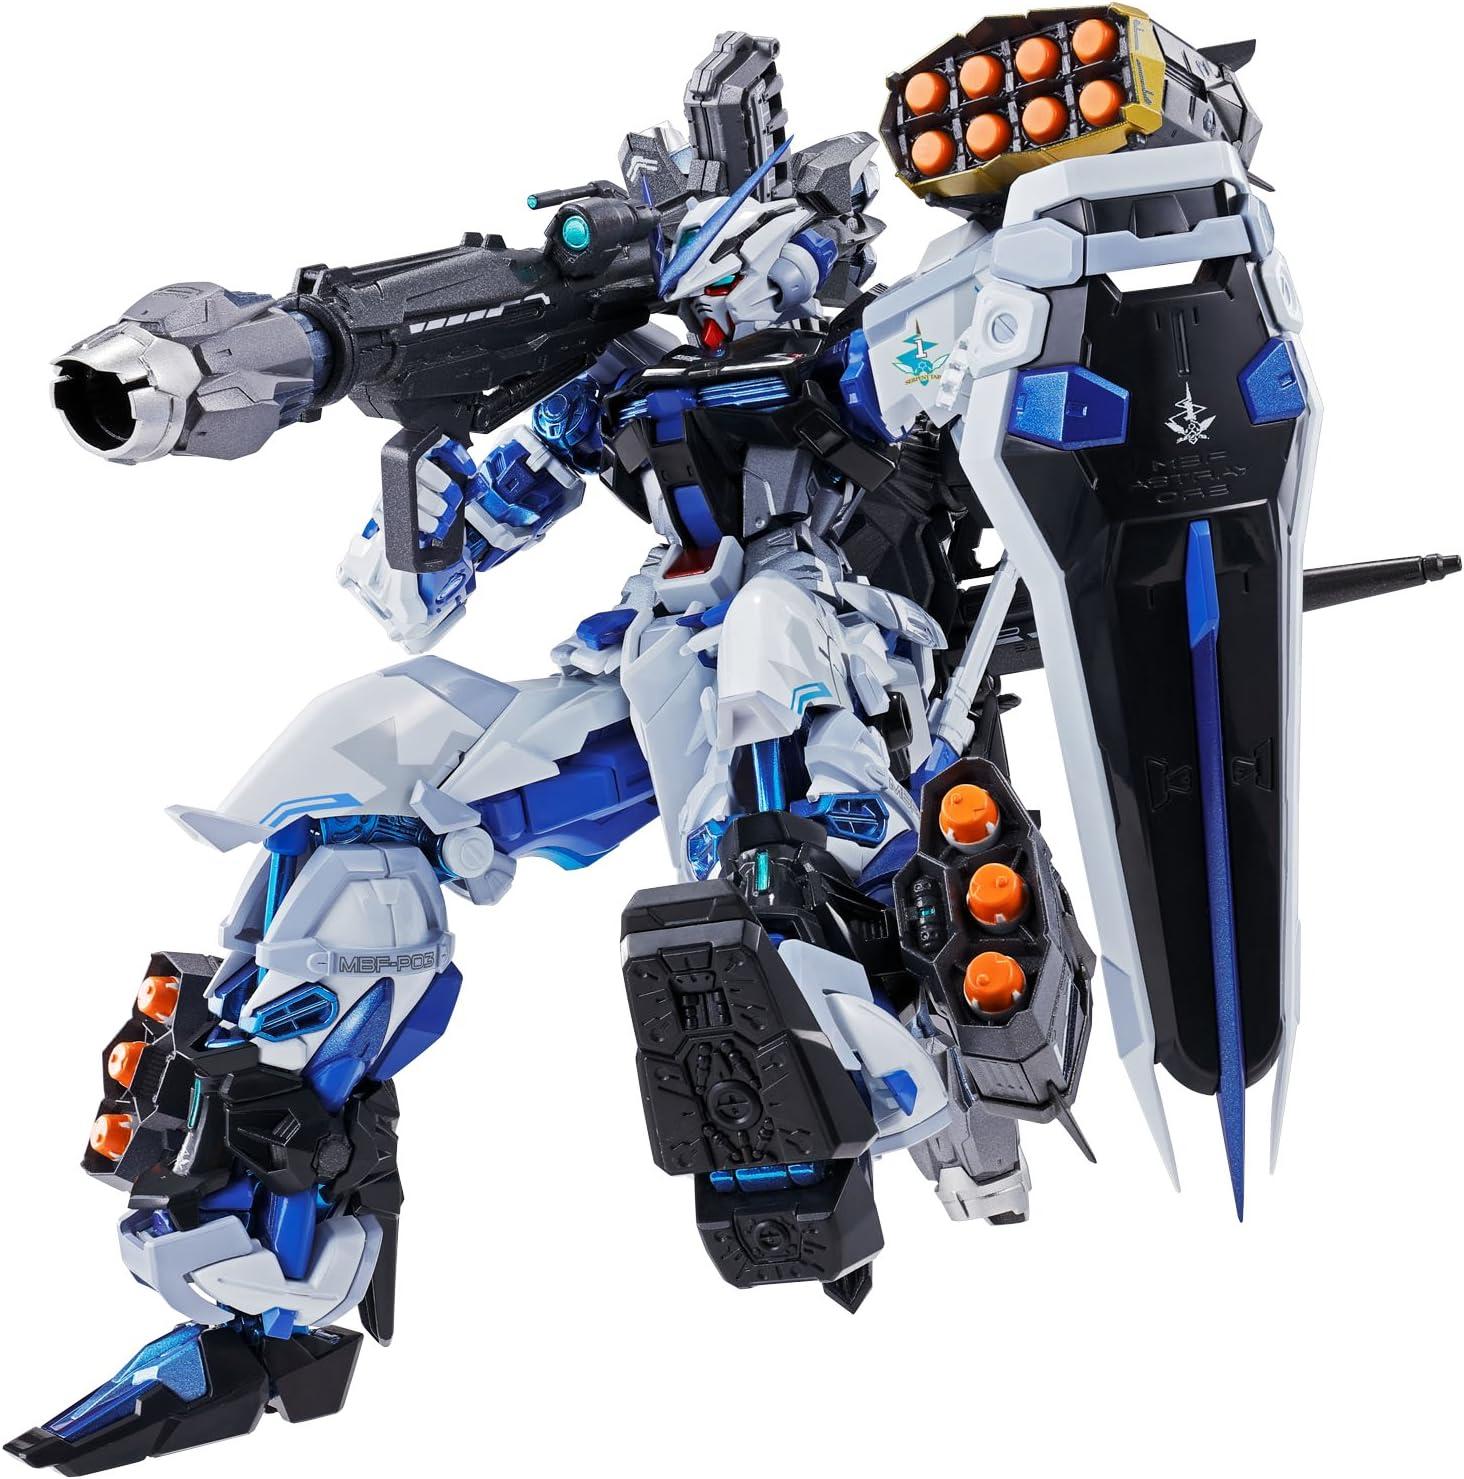 Bandai Tamashii Nations Metal Build Astray Marco Azul Gundam Seed Astray Conjunto de Armas